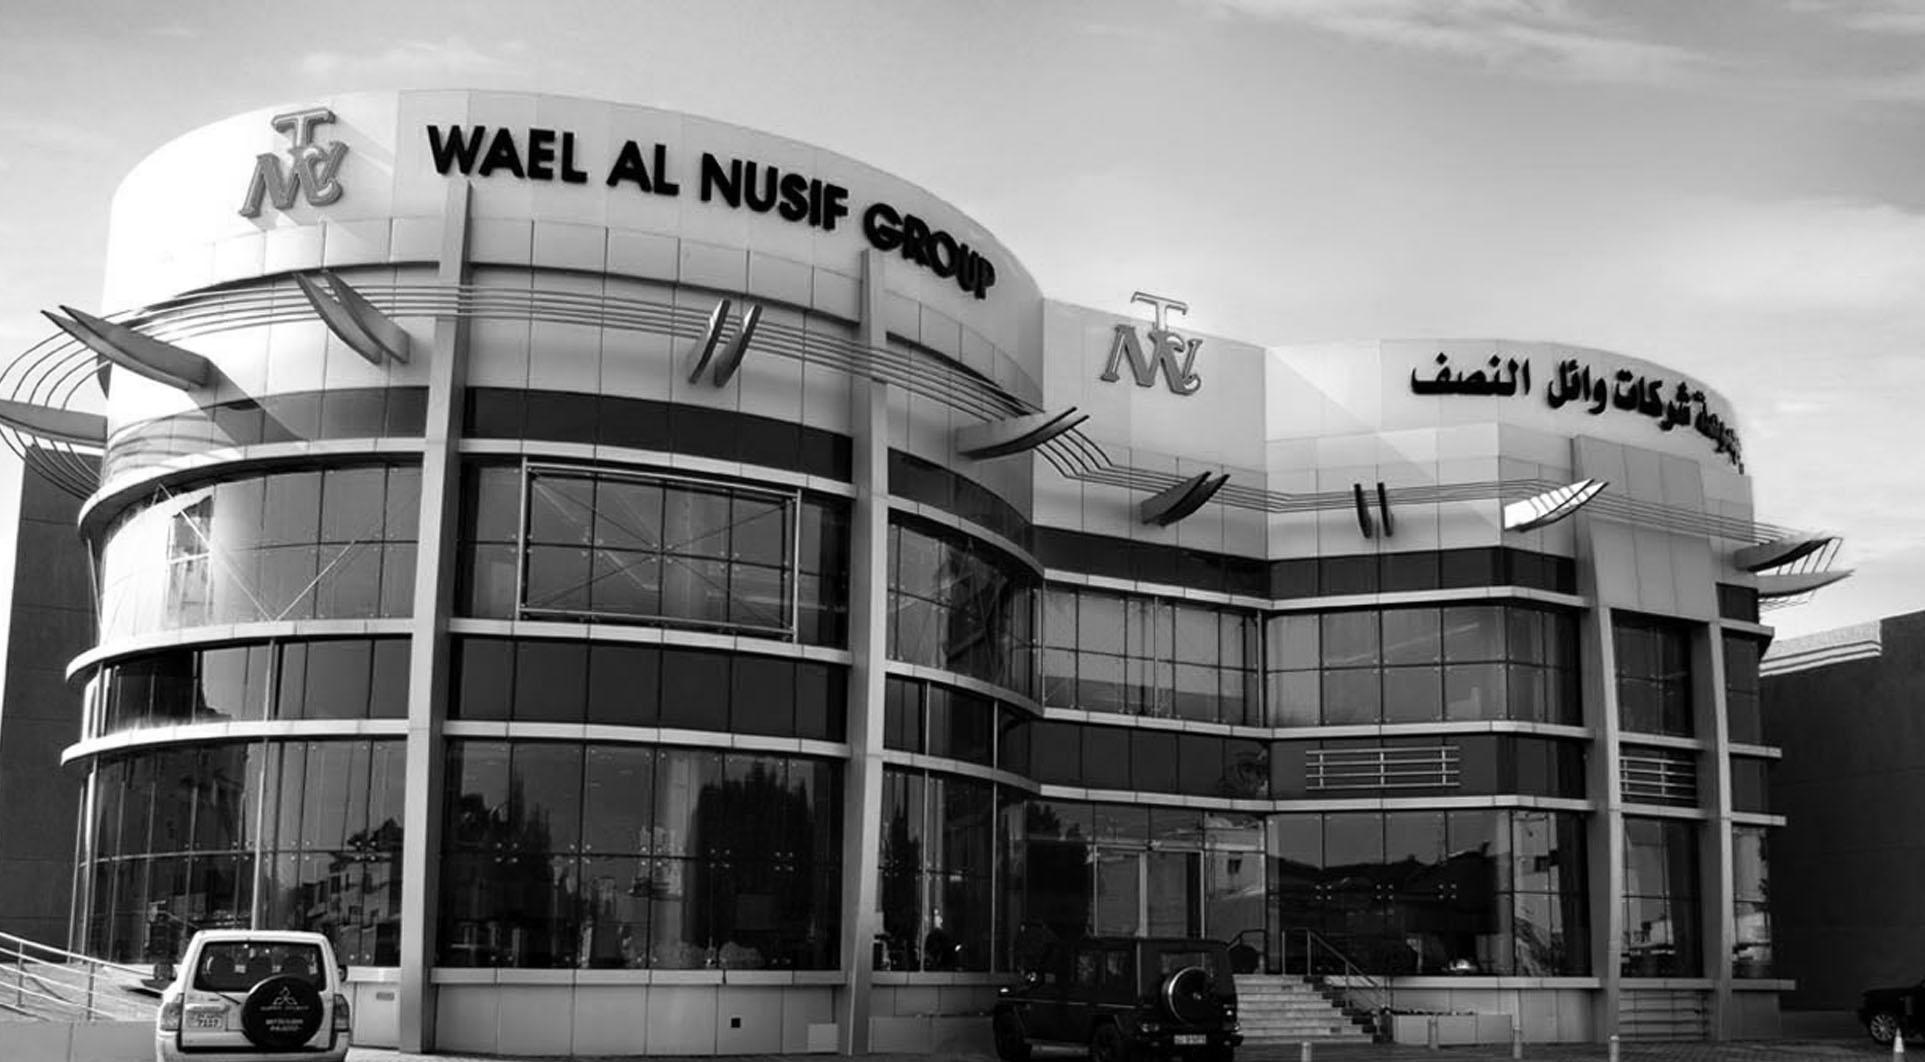 Welcome to Wael Al Nusif Group